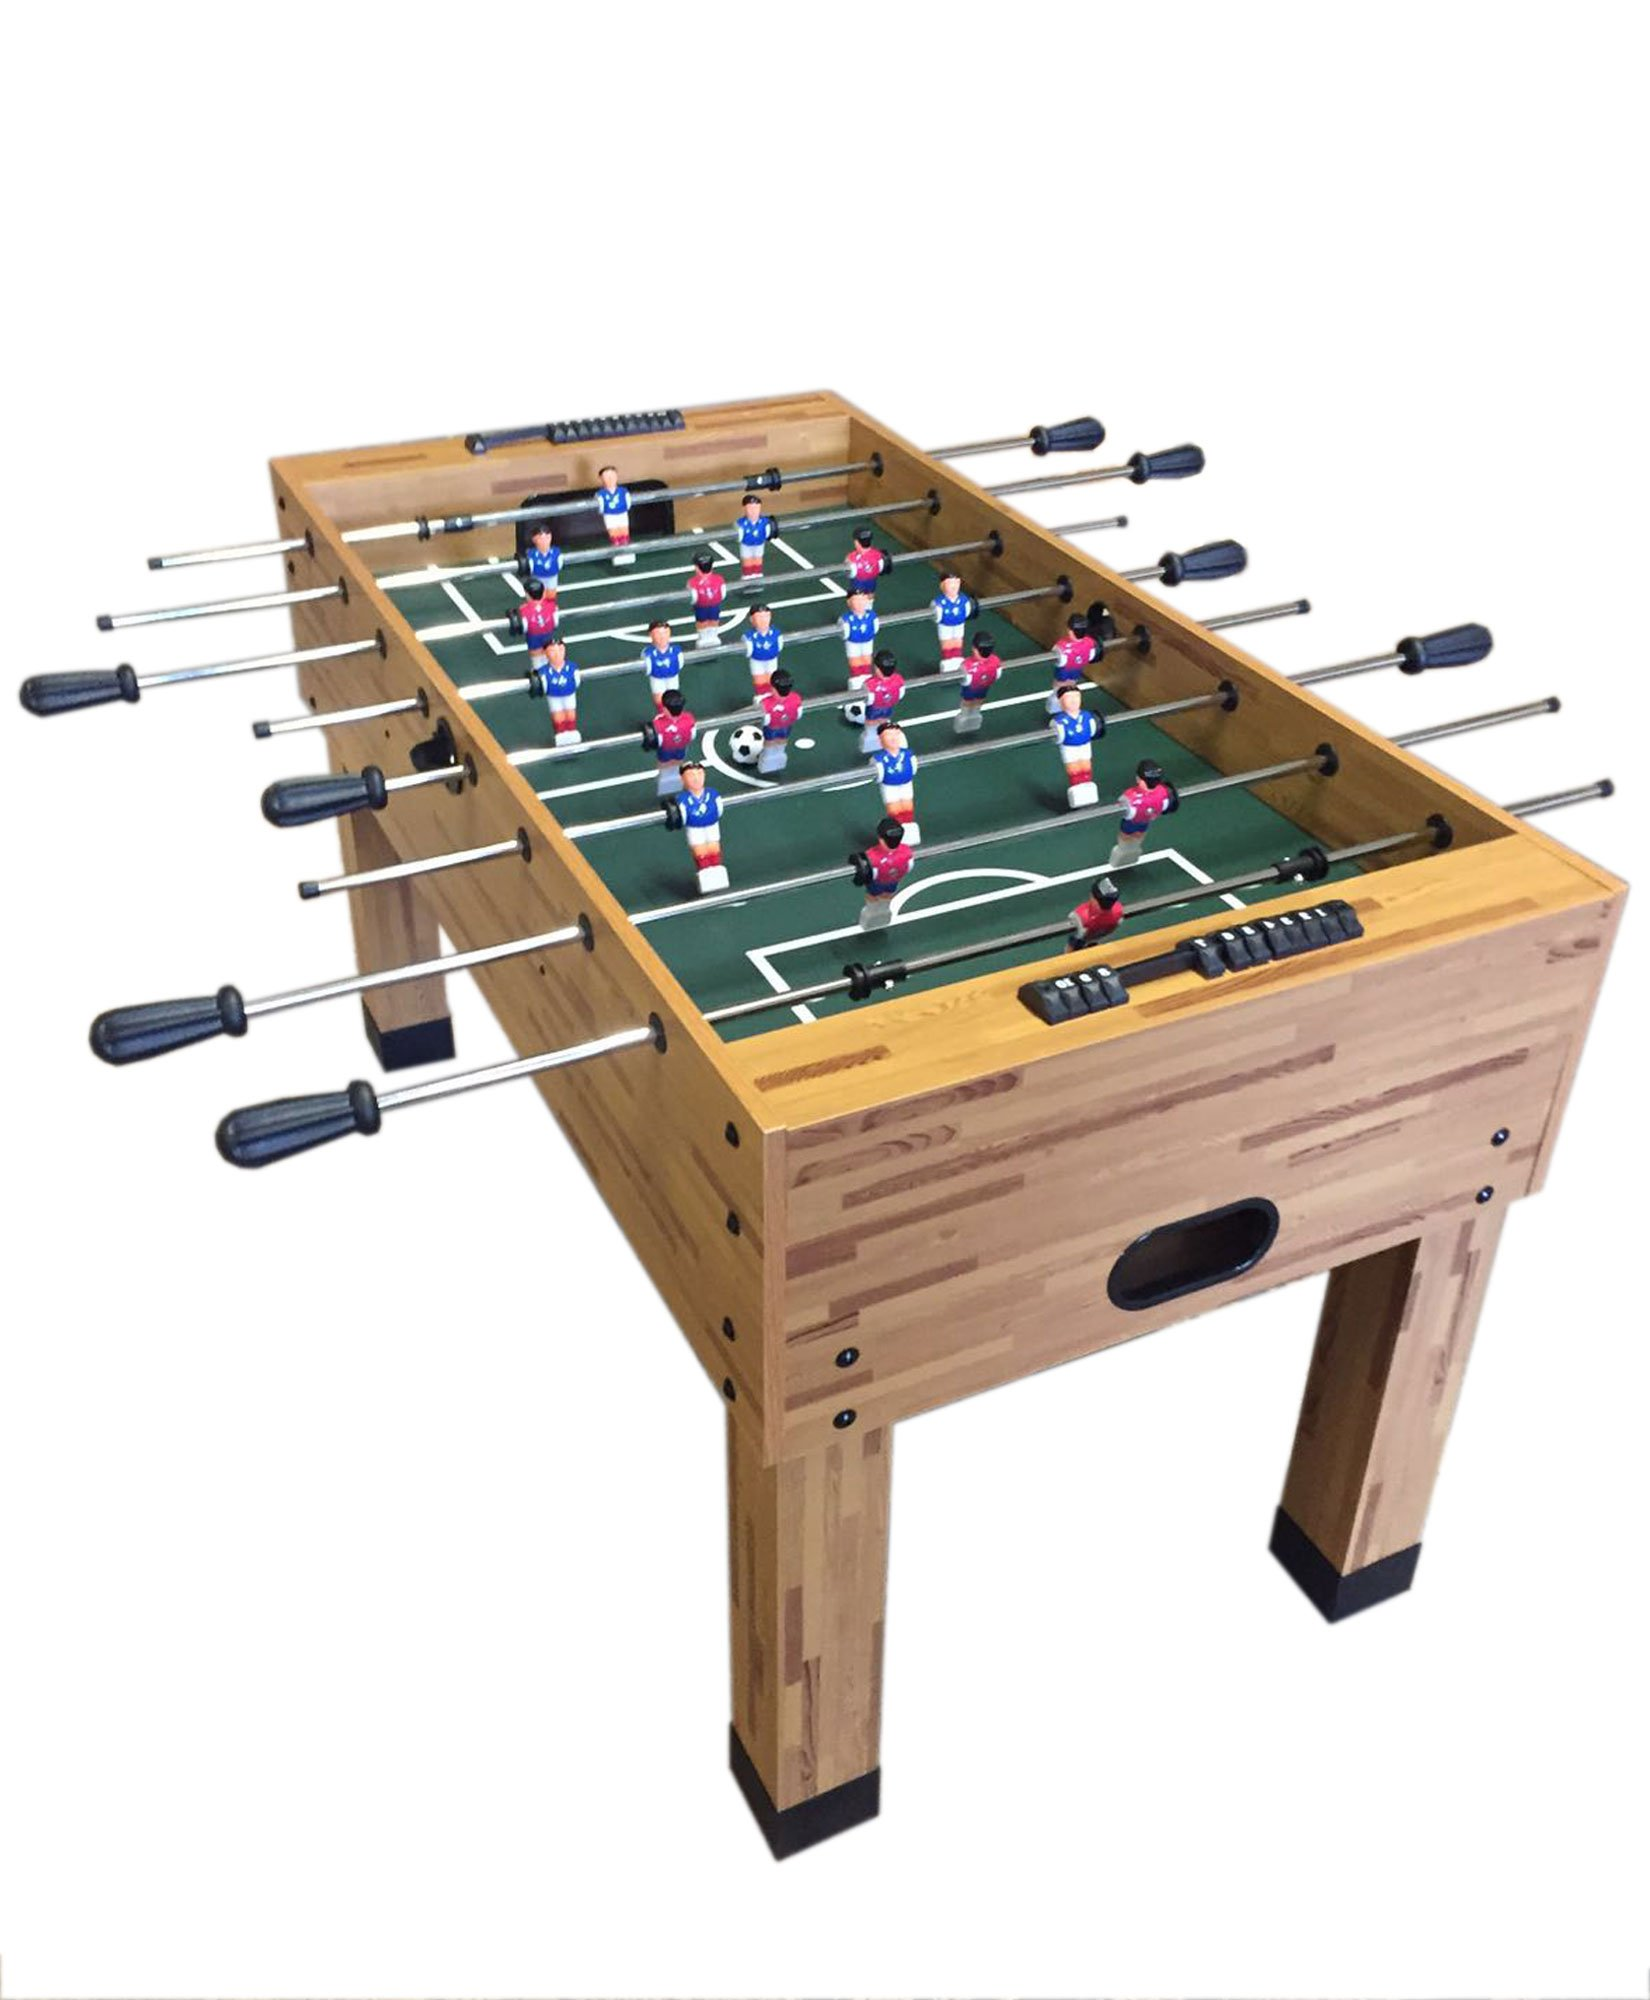 Dimensiones futbolin profesional